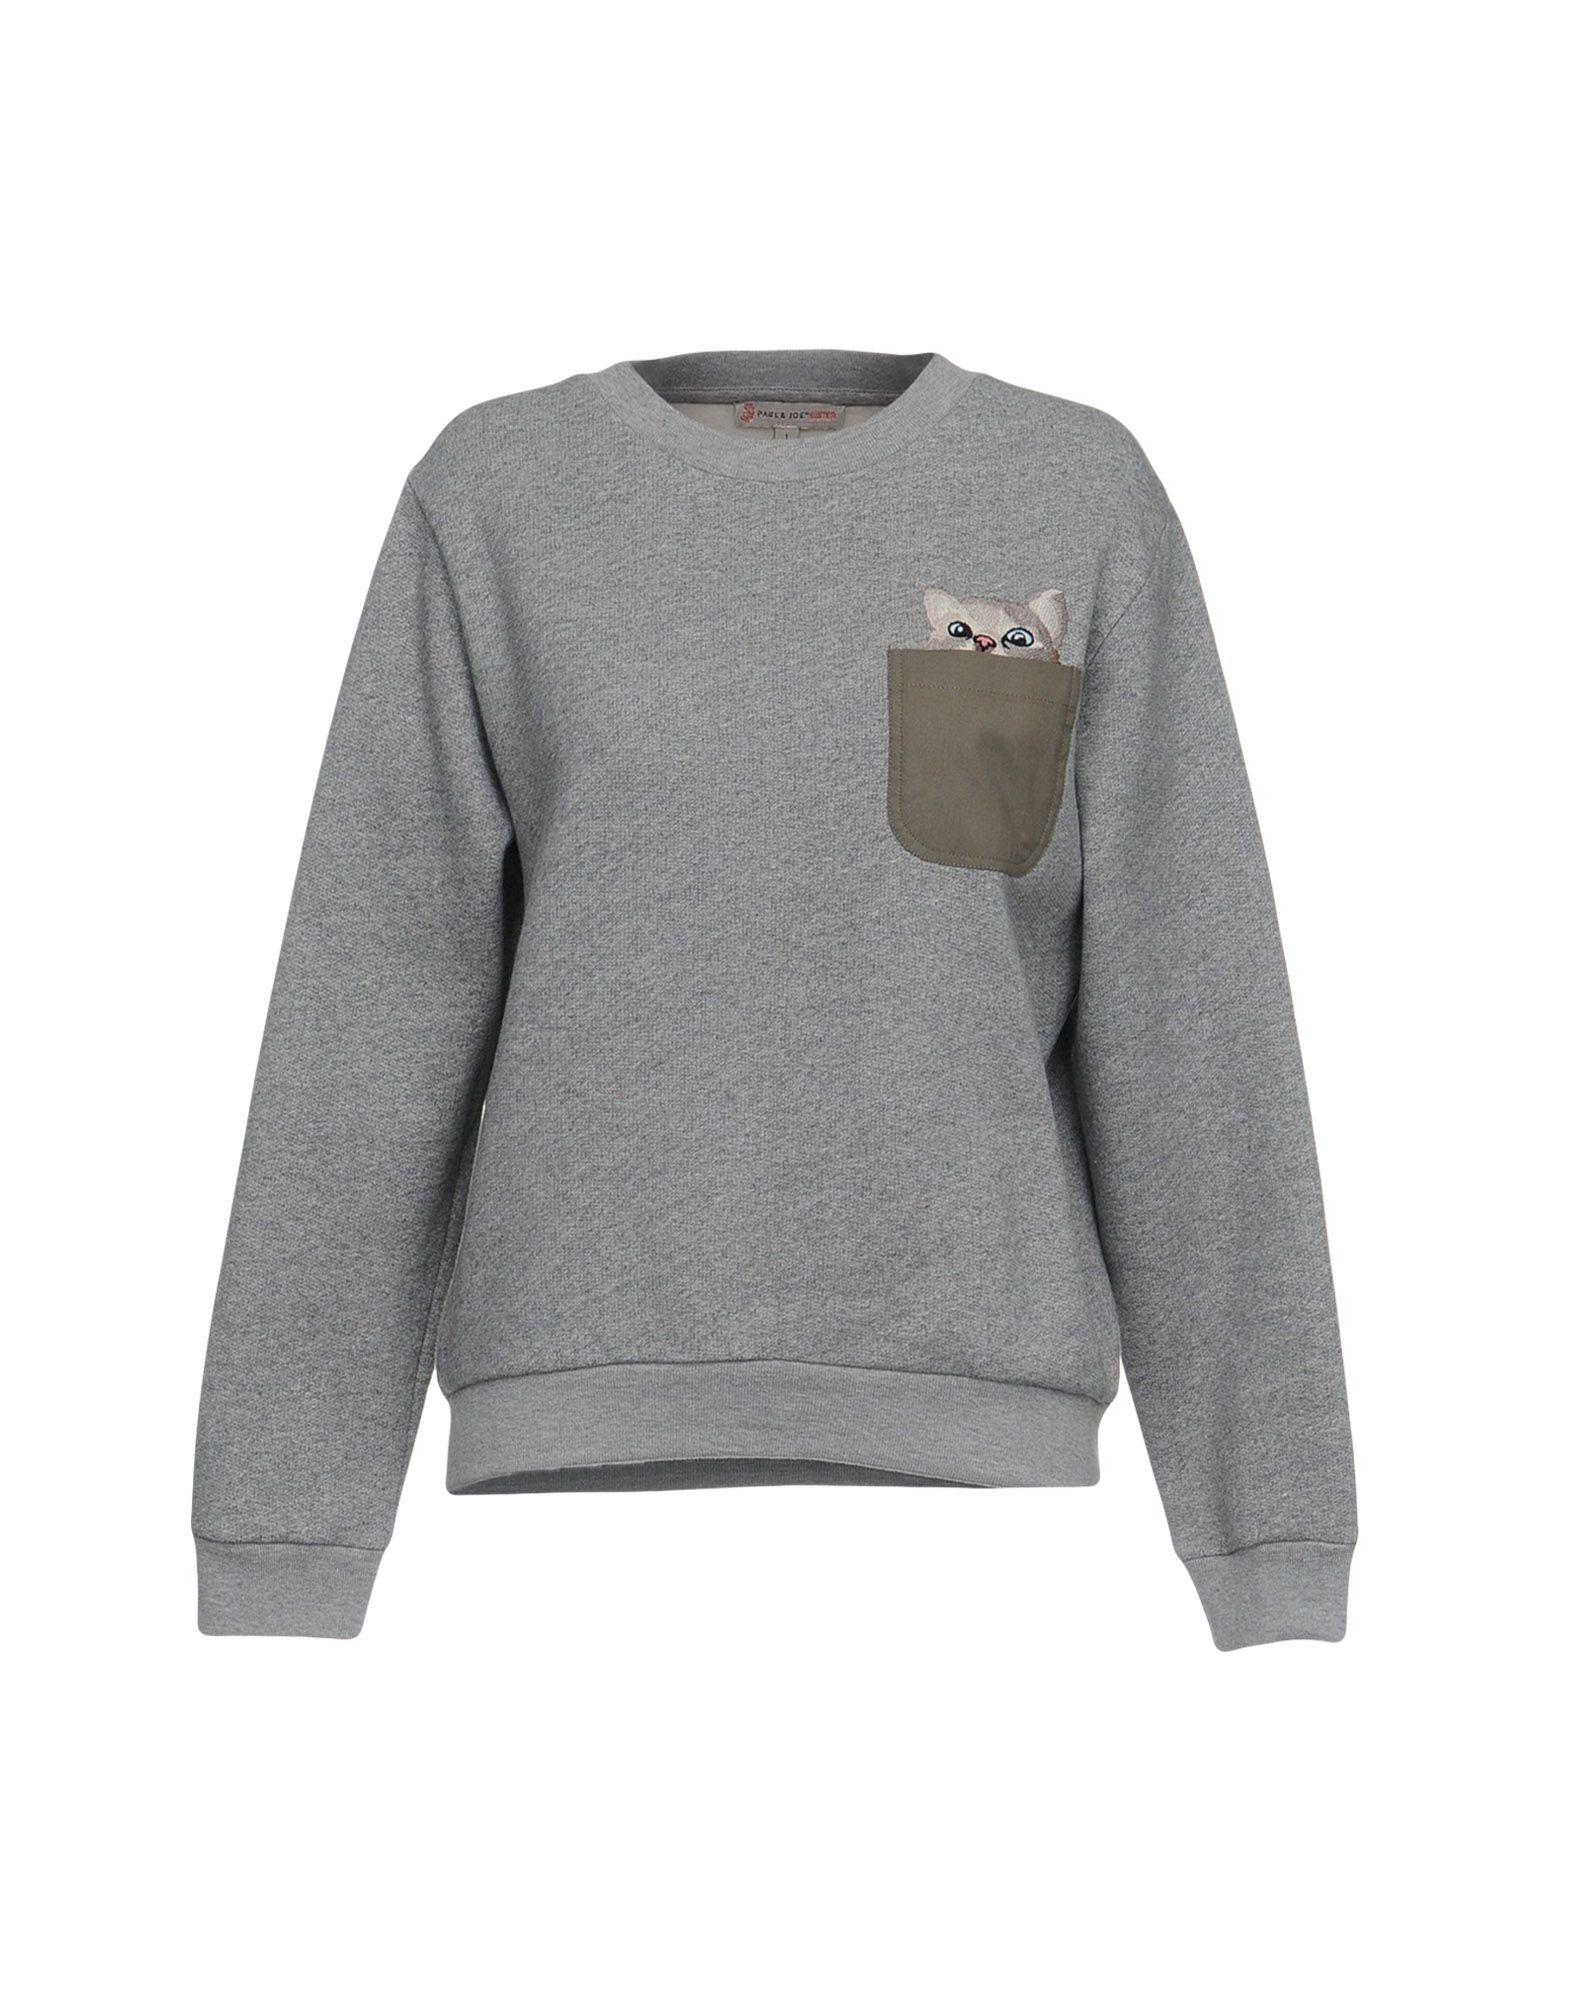 PAUL & JOE SISTER Sweatshirt in Light Grey